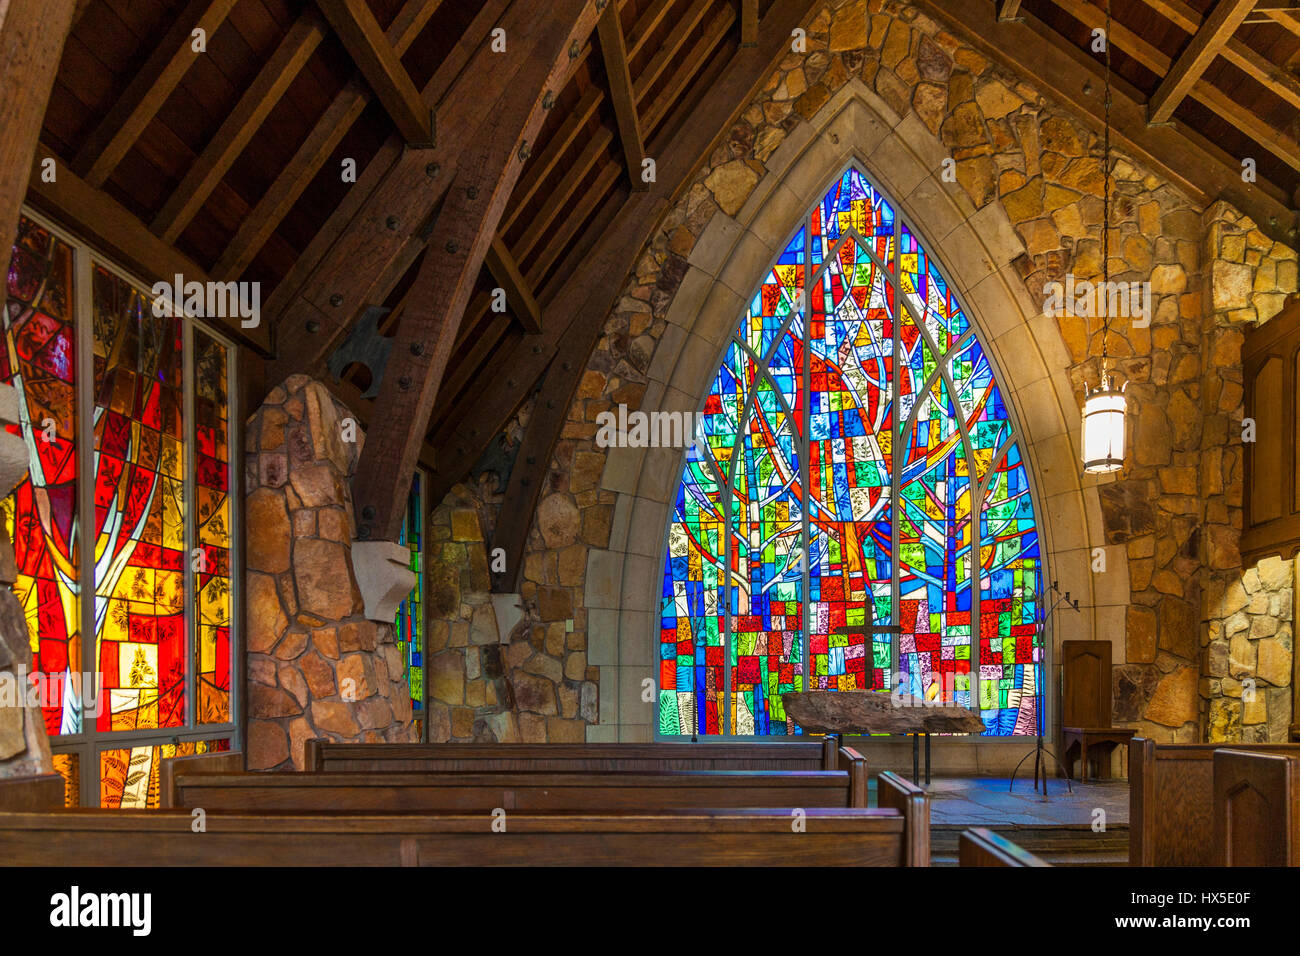 Stained Glass artwork windows in Ida Cason Callaway Memorial Chapel ...